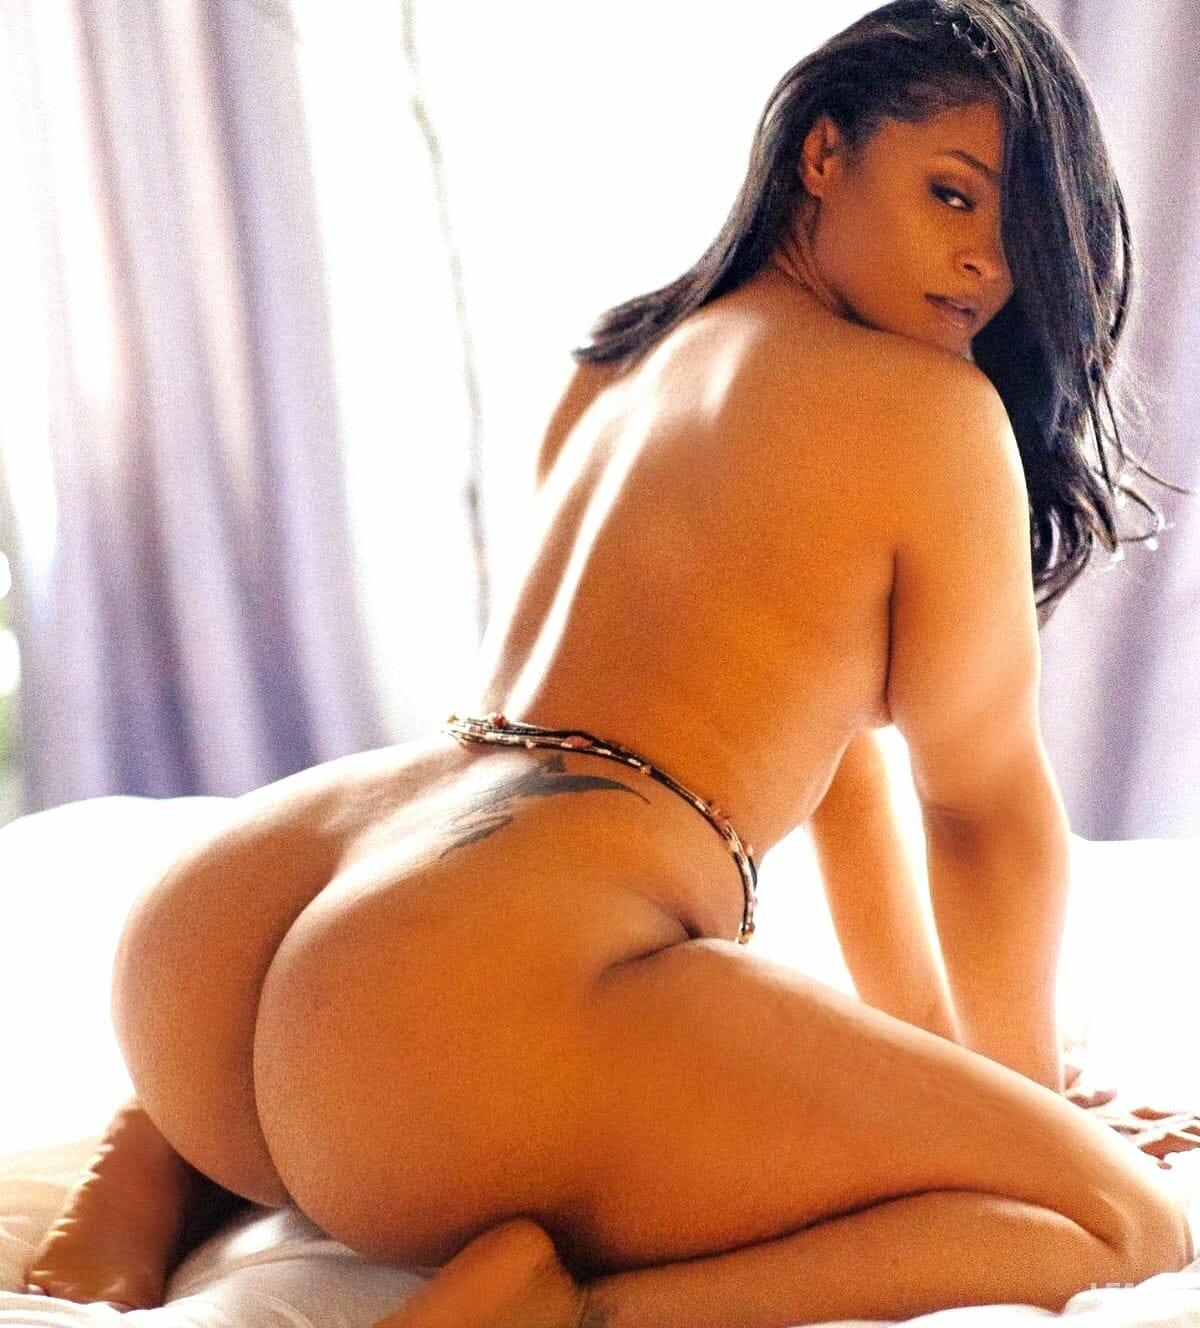 maliah michel sexy